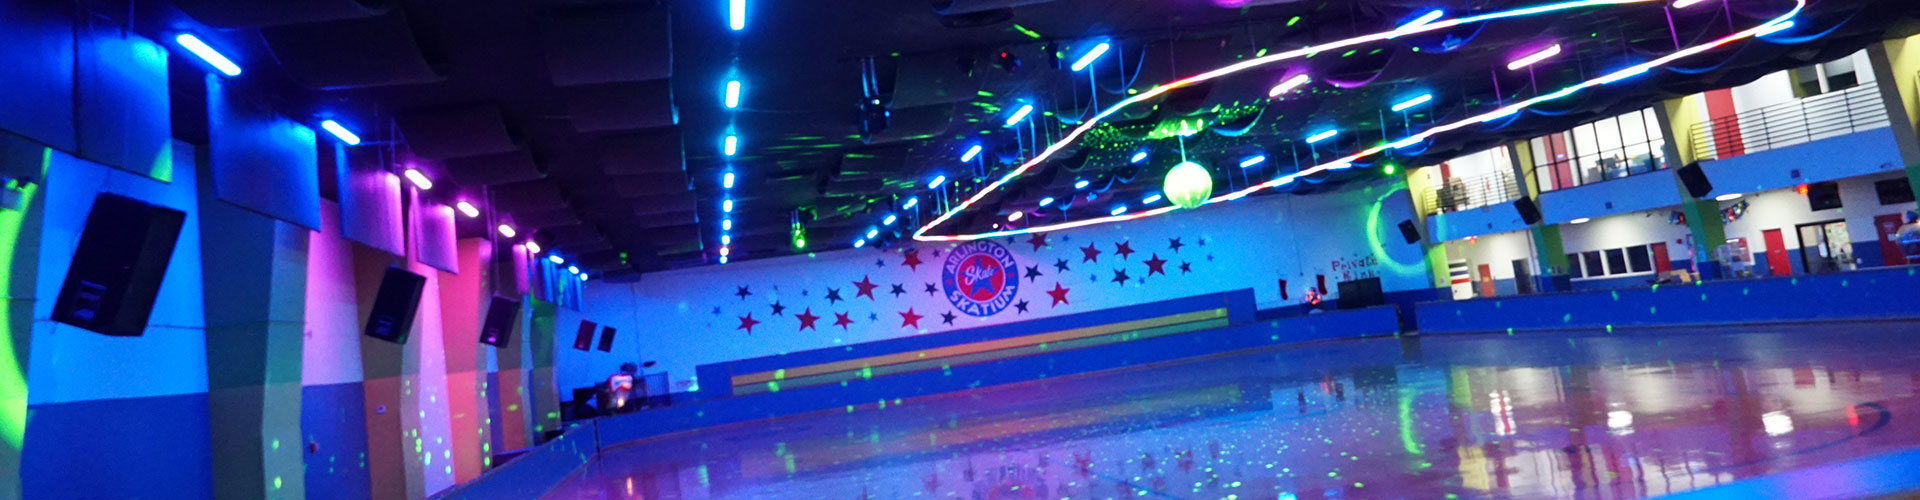 roller skating facility arlington texas